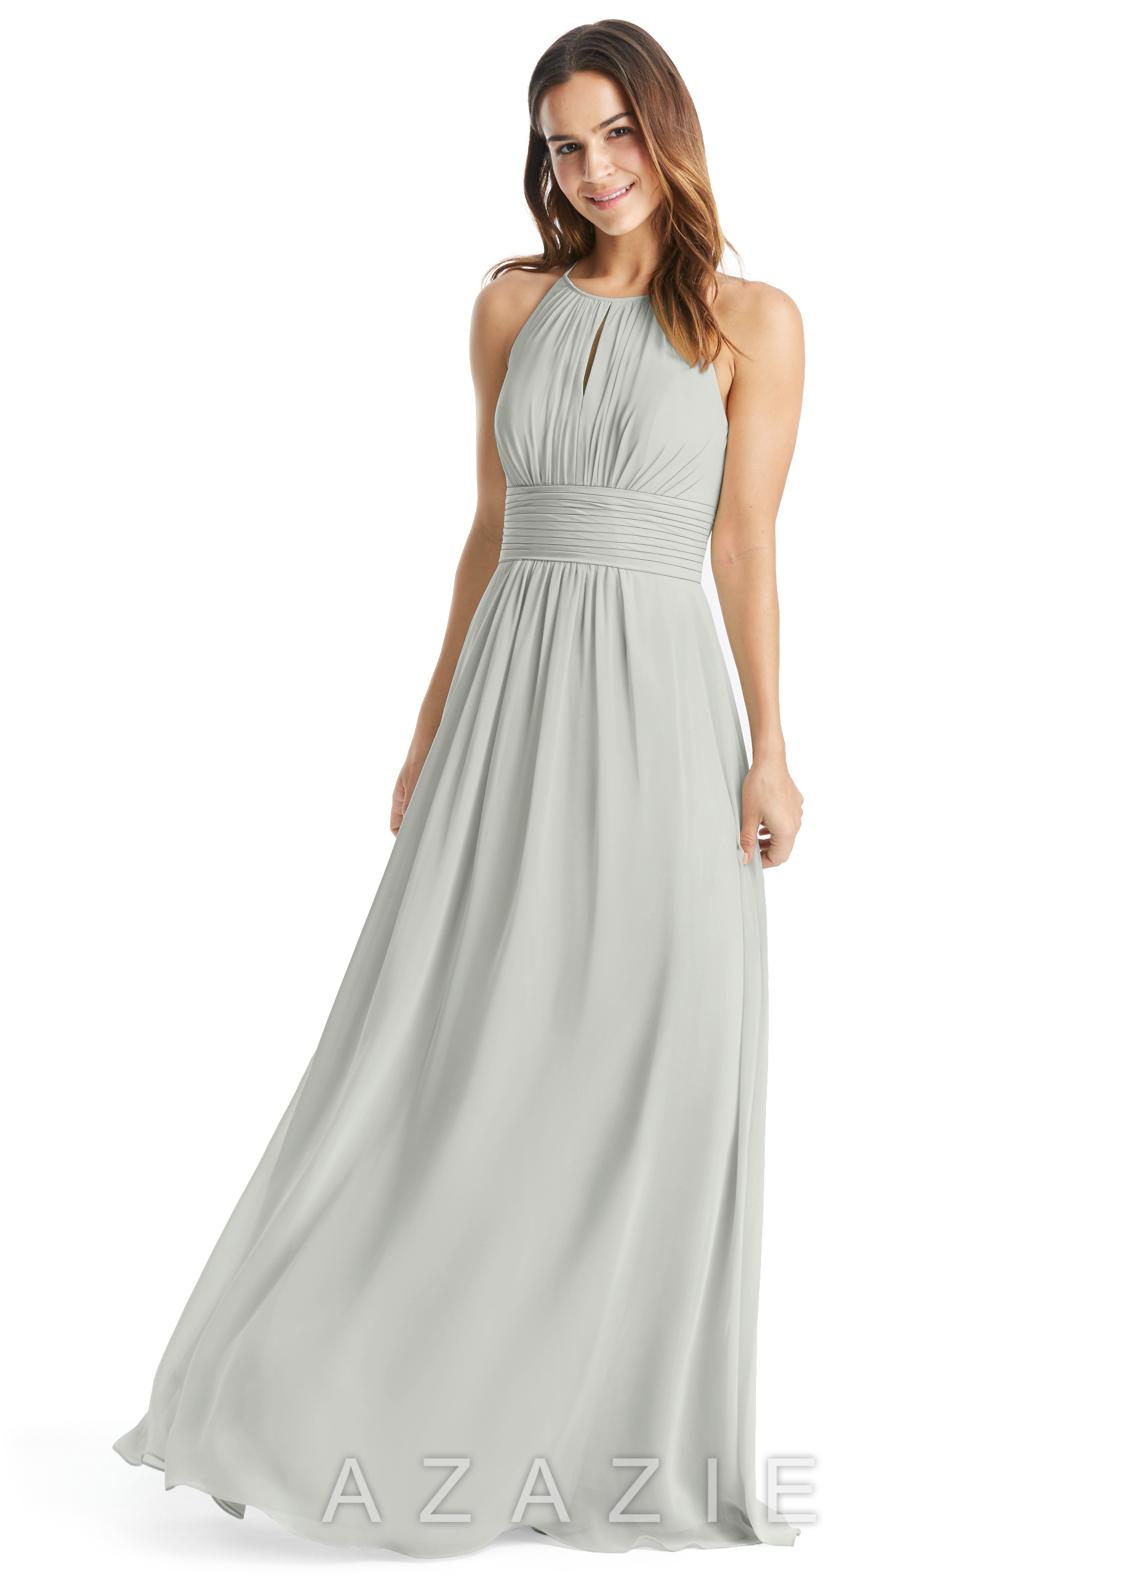 Azazie bonnie bridesmaid dress azazie color silver ombrellifo Choice Image